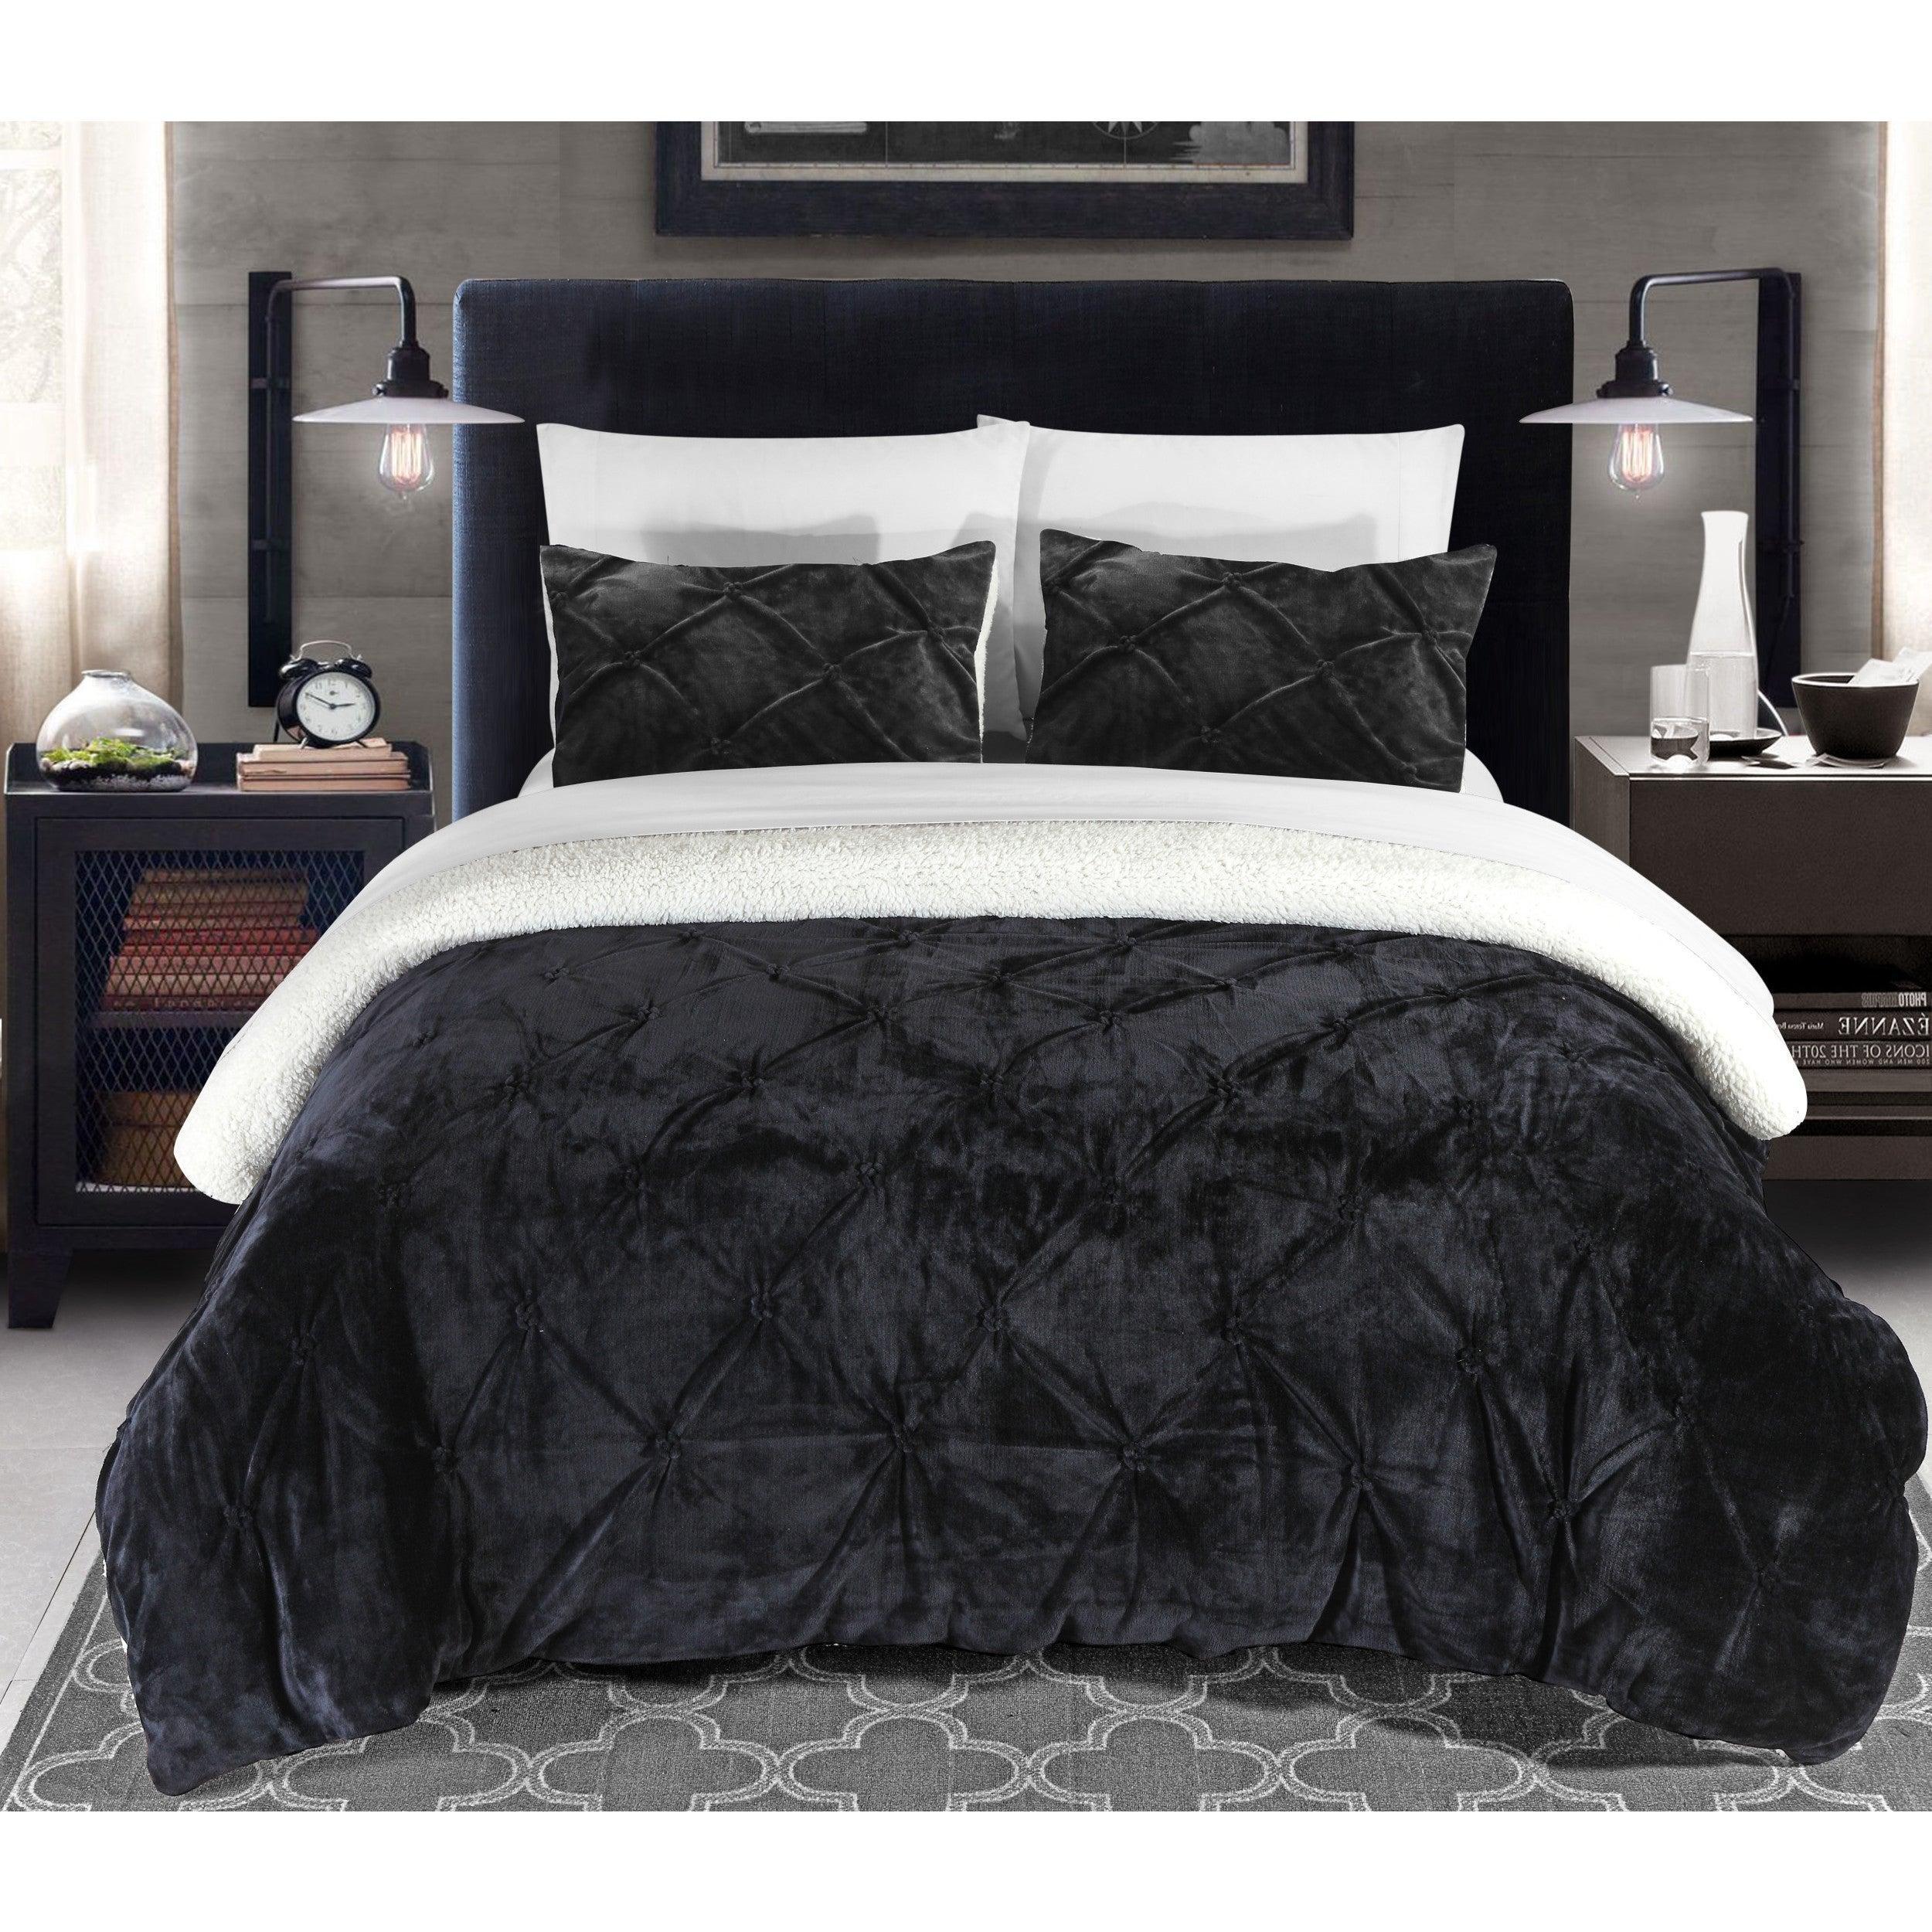 Chic Home Kaiser 7 Piece Sherpa Comforter Bedding Set Black On Sale Overstock 17433427 Queen